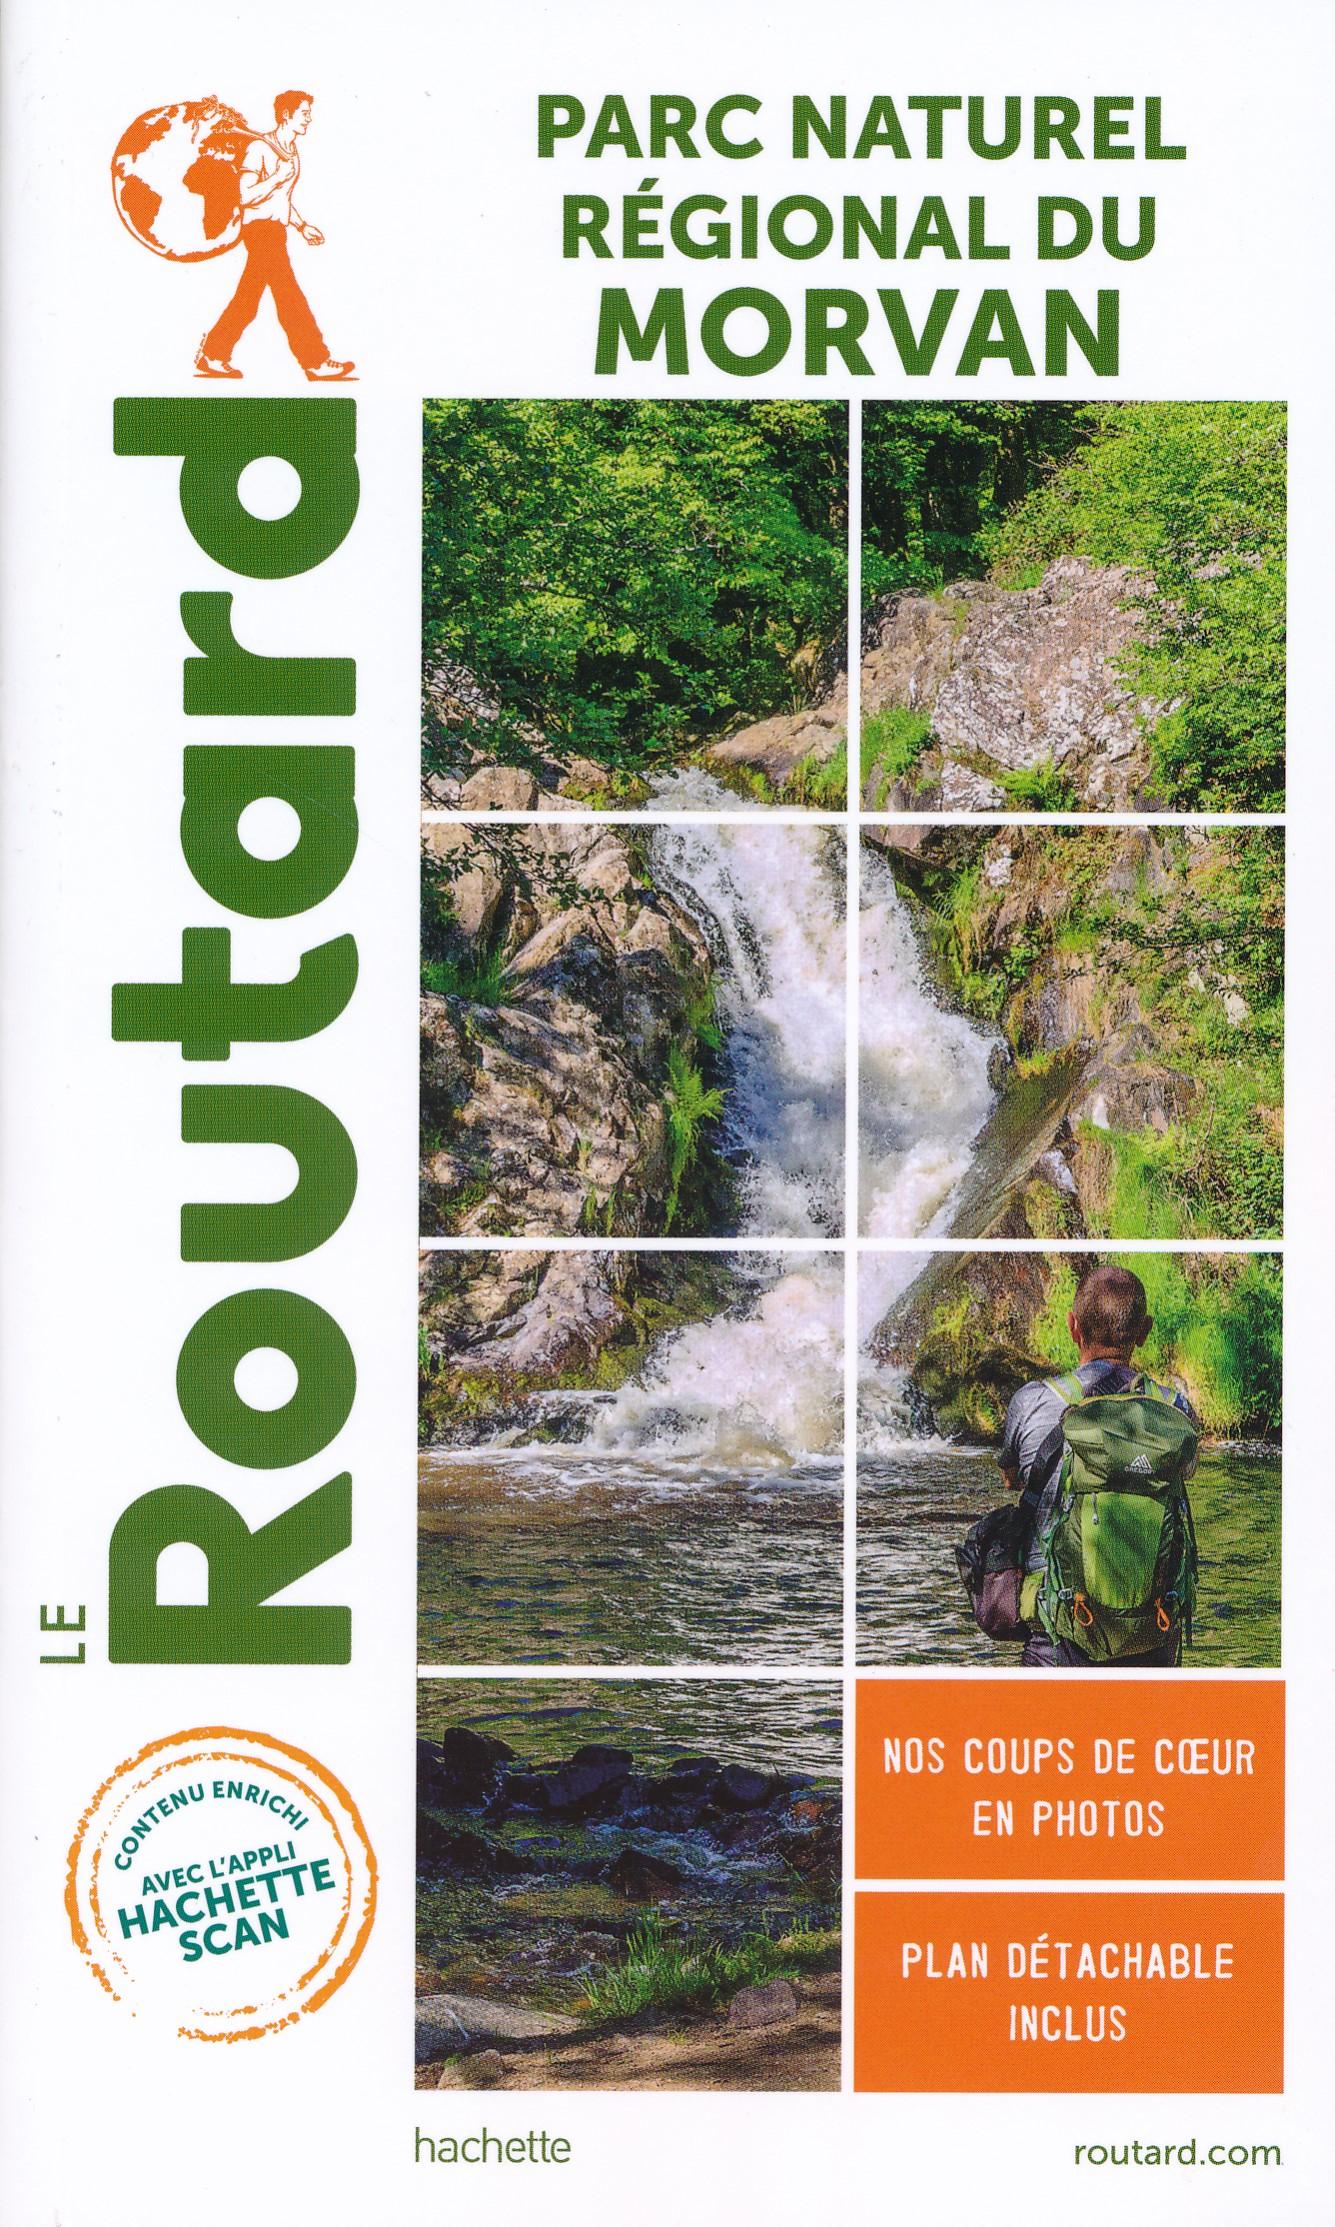 Reisgids Parc naturel du Morvan | Routard de zwerver